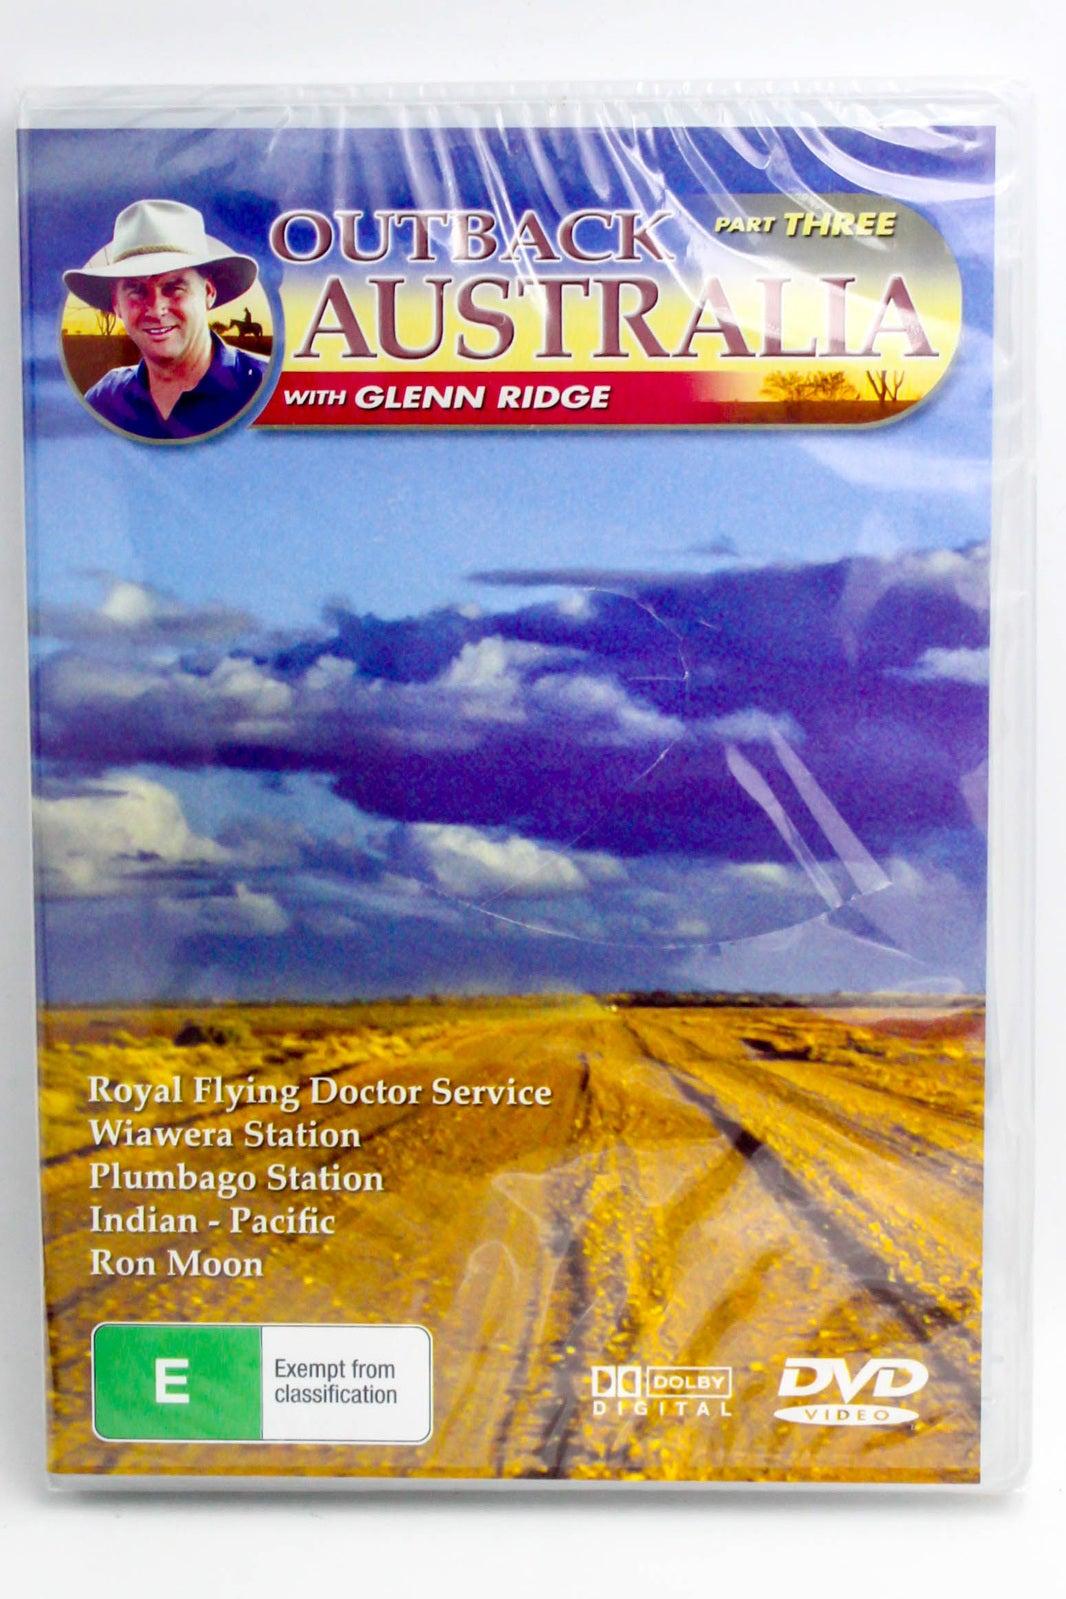 Outback Australia with Glenn Ridge Part 3 -Educational DVD Series New